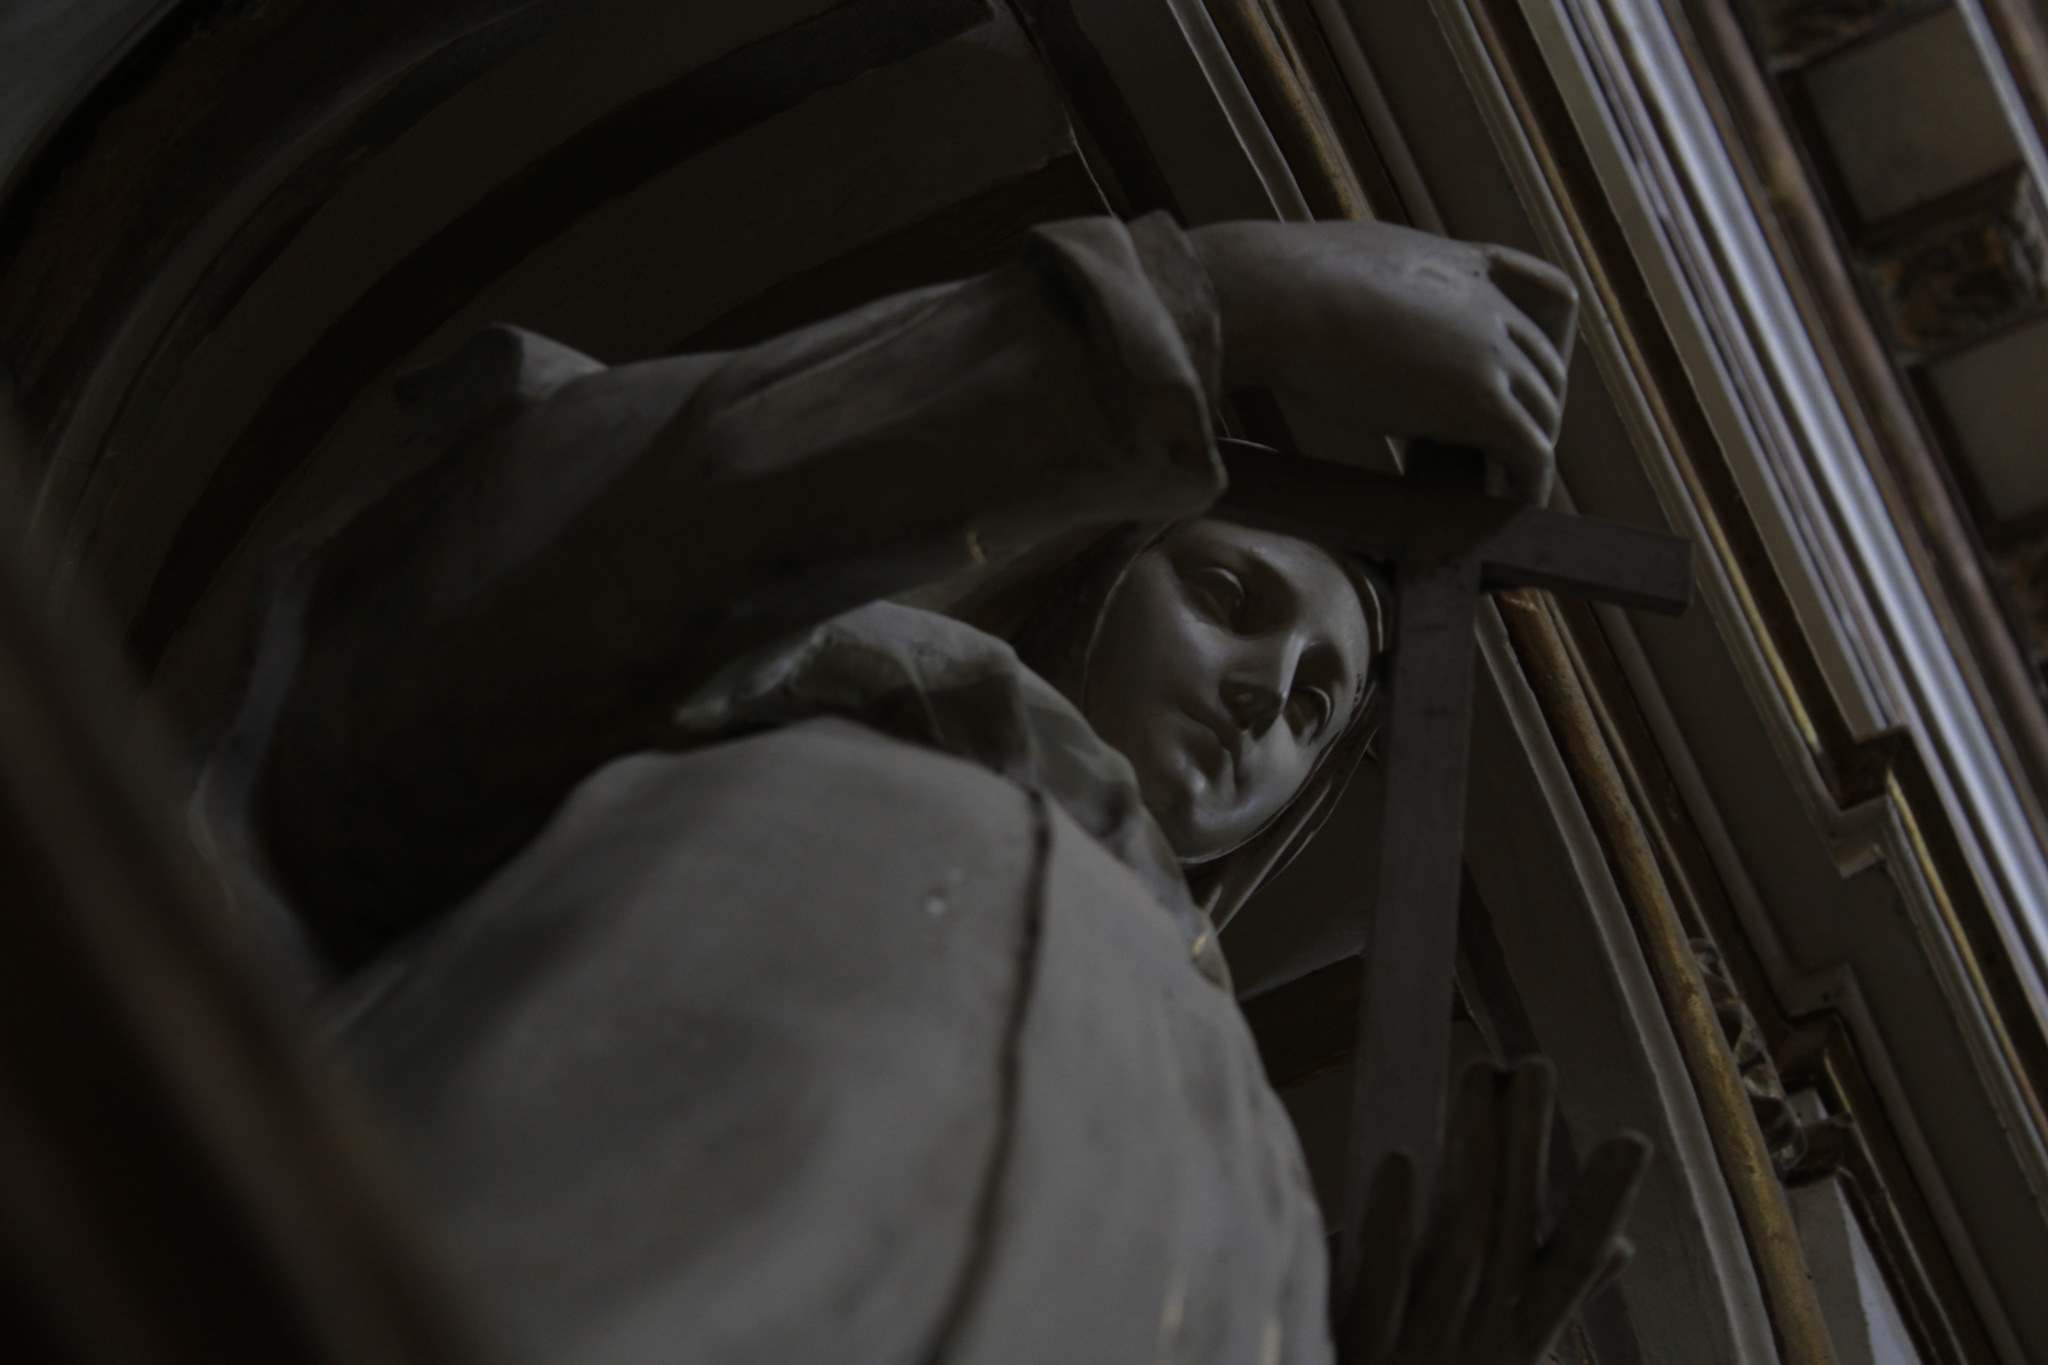 St. Rita by Laura Di Mauro